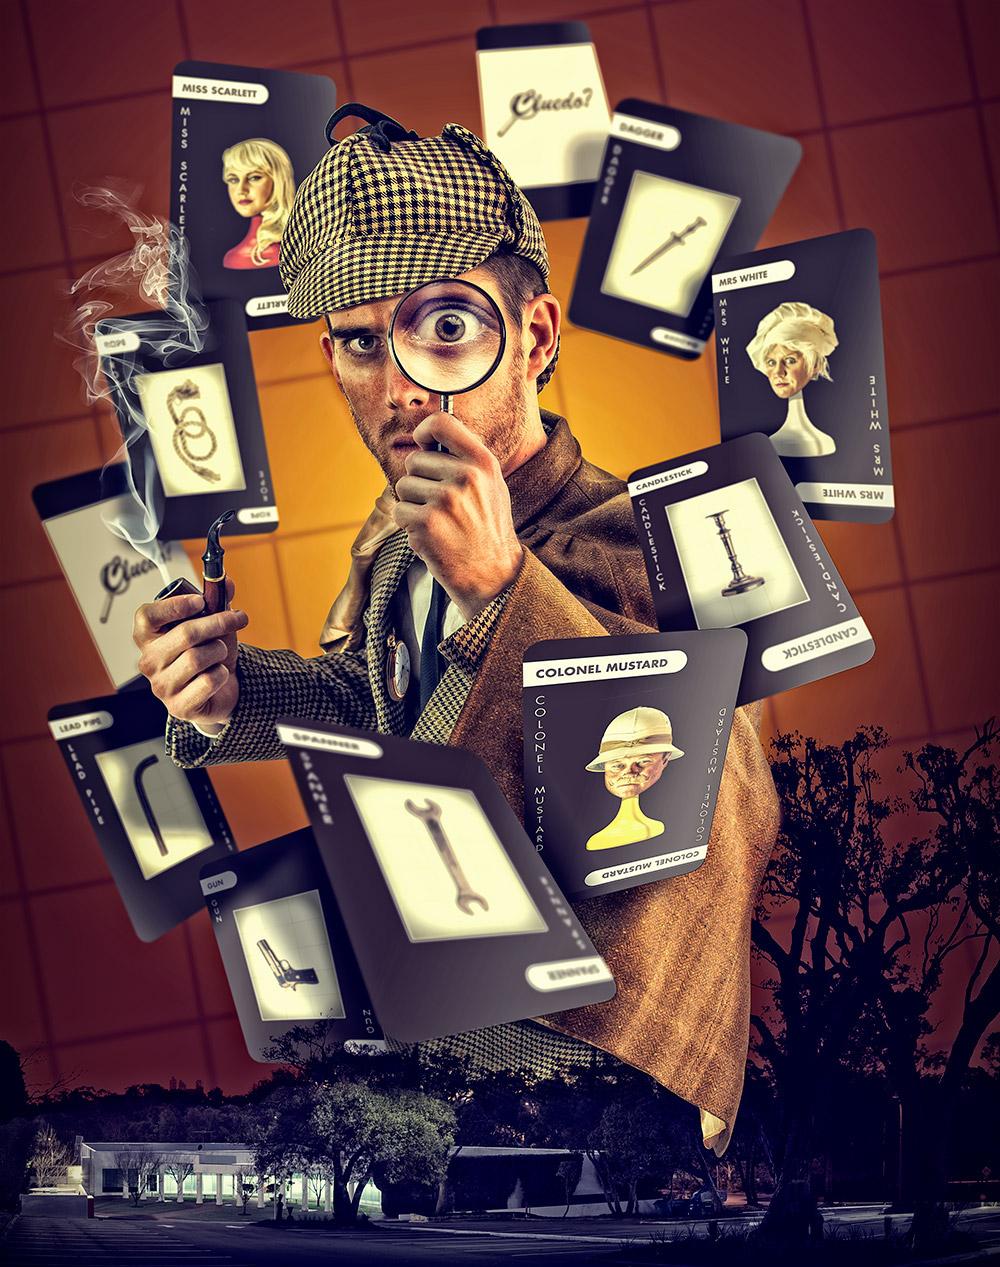 Adrian Fretwell,  'Cluedo' Murder Mystery Events